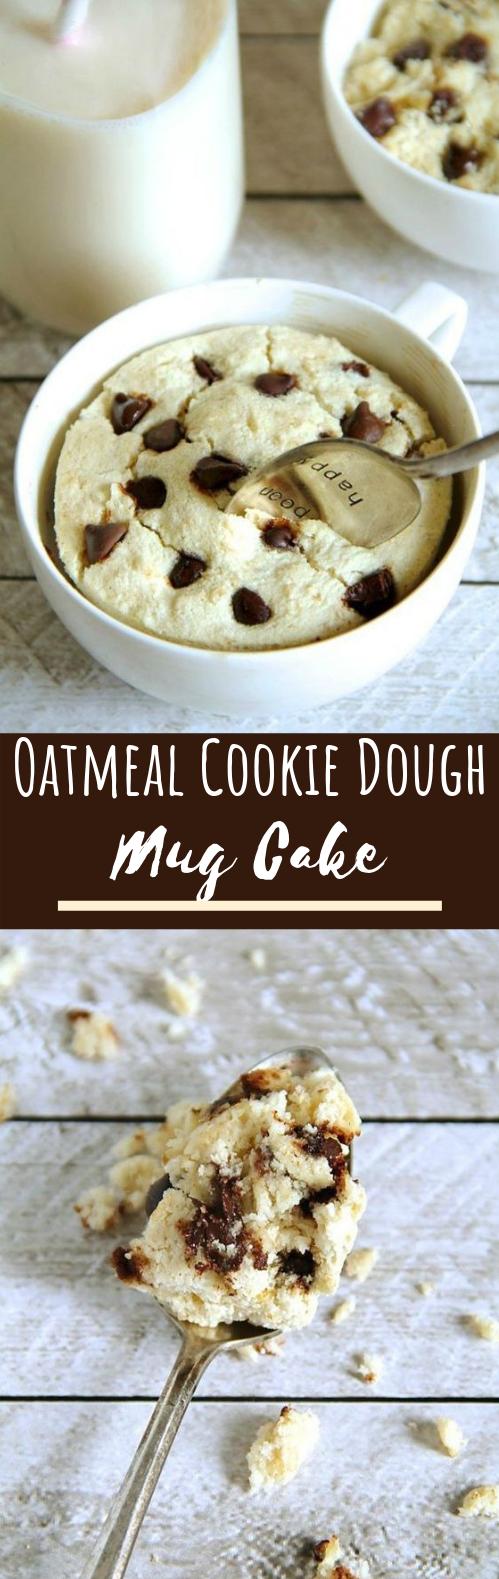 Oatmeal Cookie Dough Mug Cake #cake #desserts